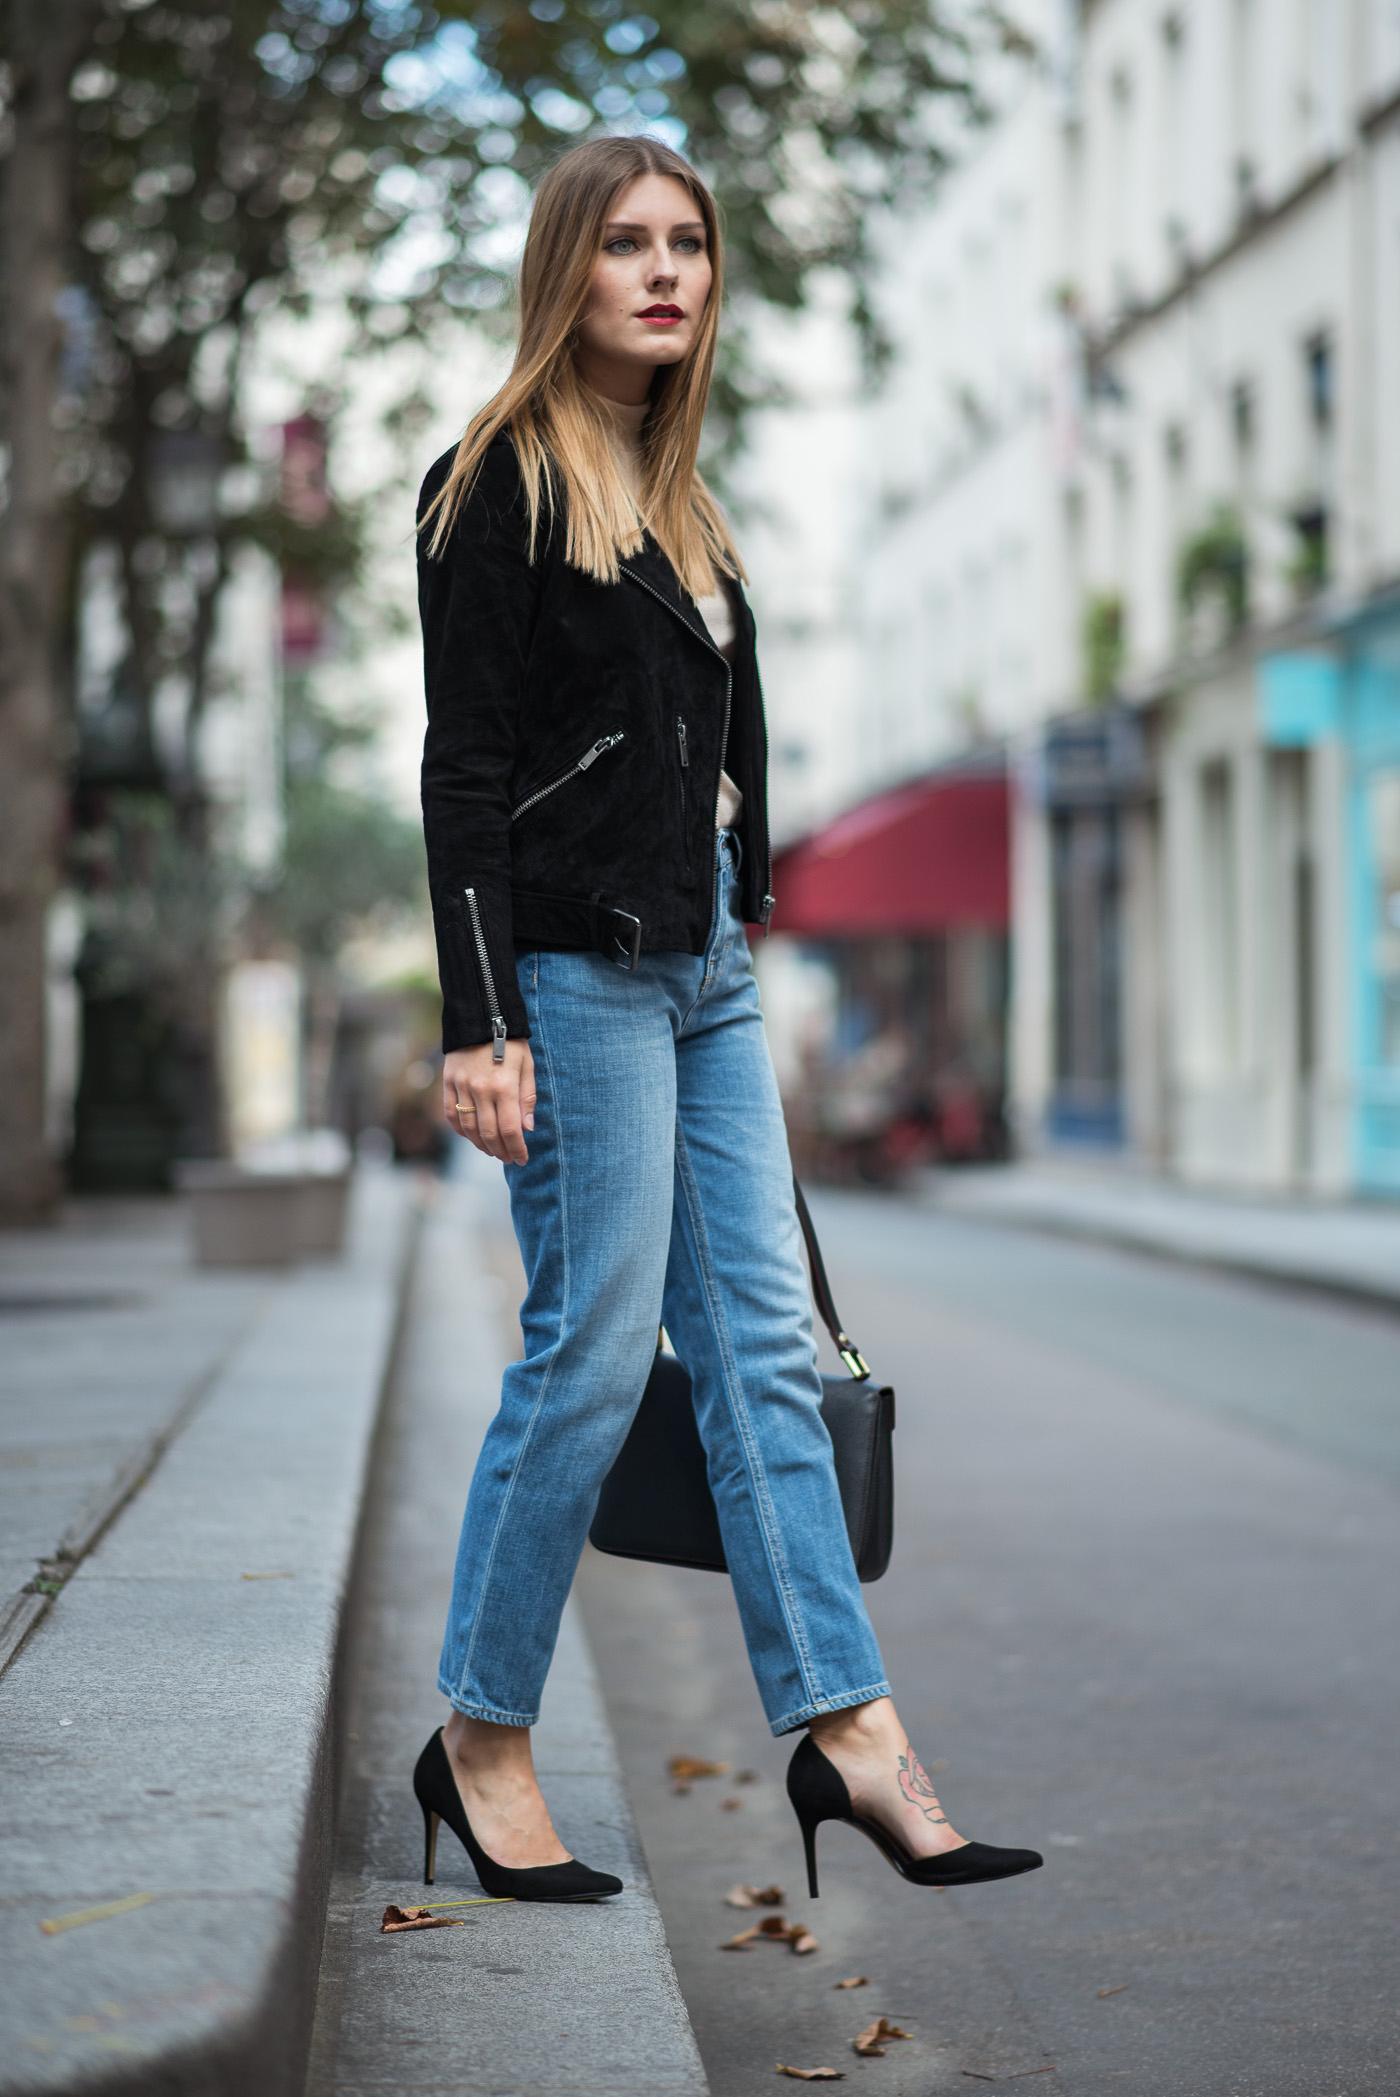 paris_fashion_week_leather_jacket_selected_femme_3